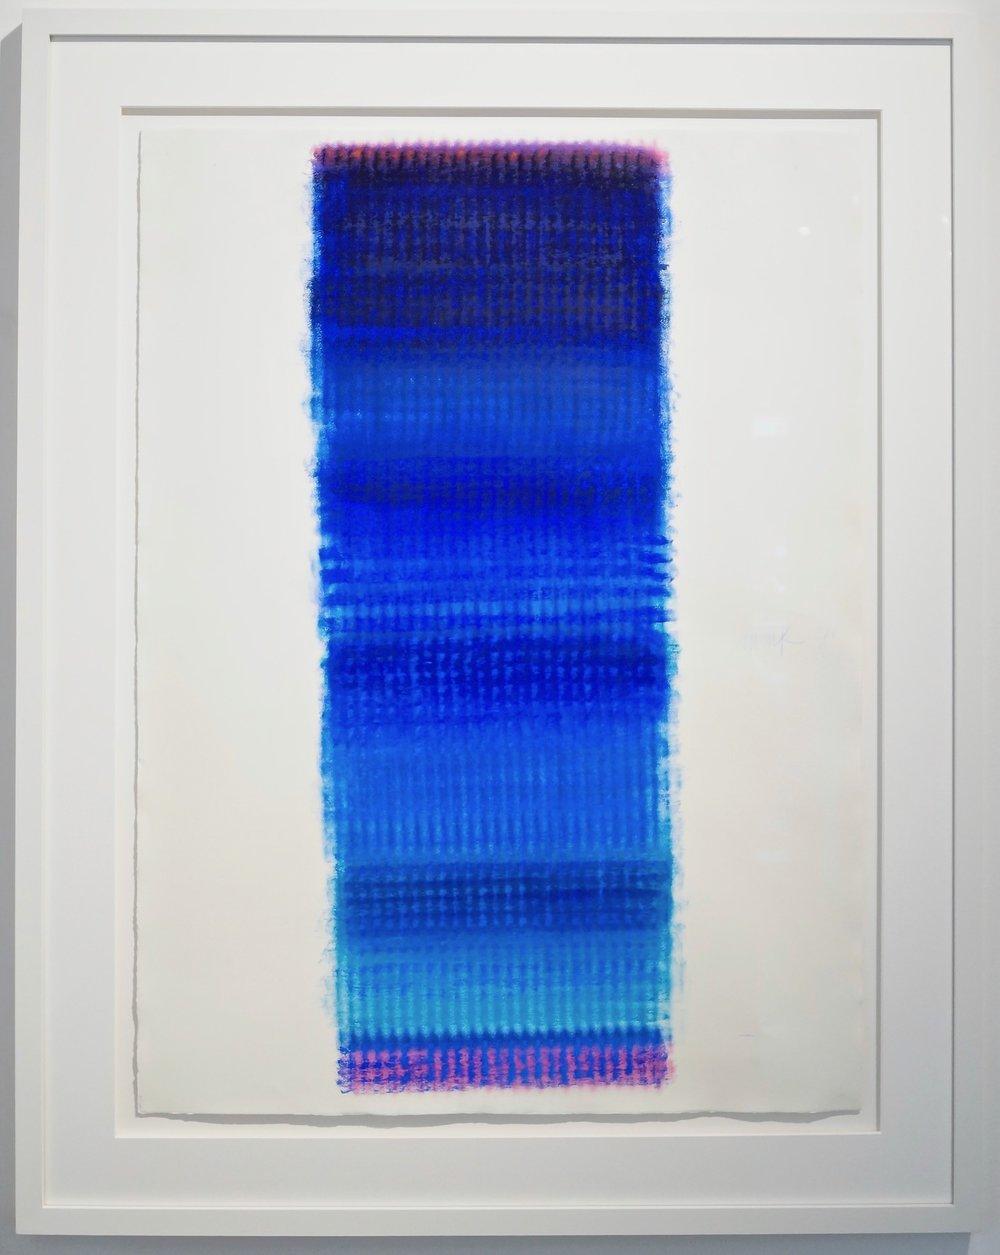 Heinz Mack Ohne Titel, 2006 crayon on handmade paper 106.5 x 78.5 cm | 42 x 31 in HEM/P 4